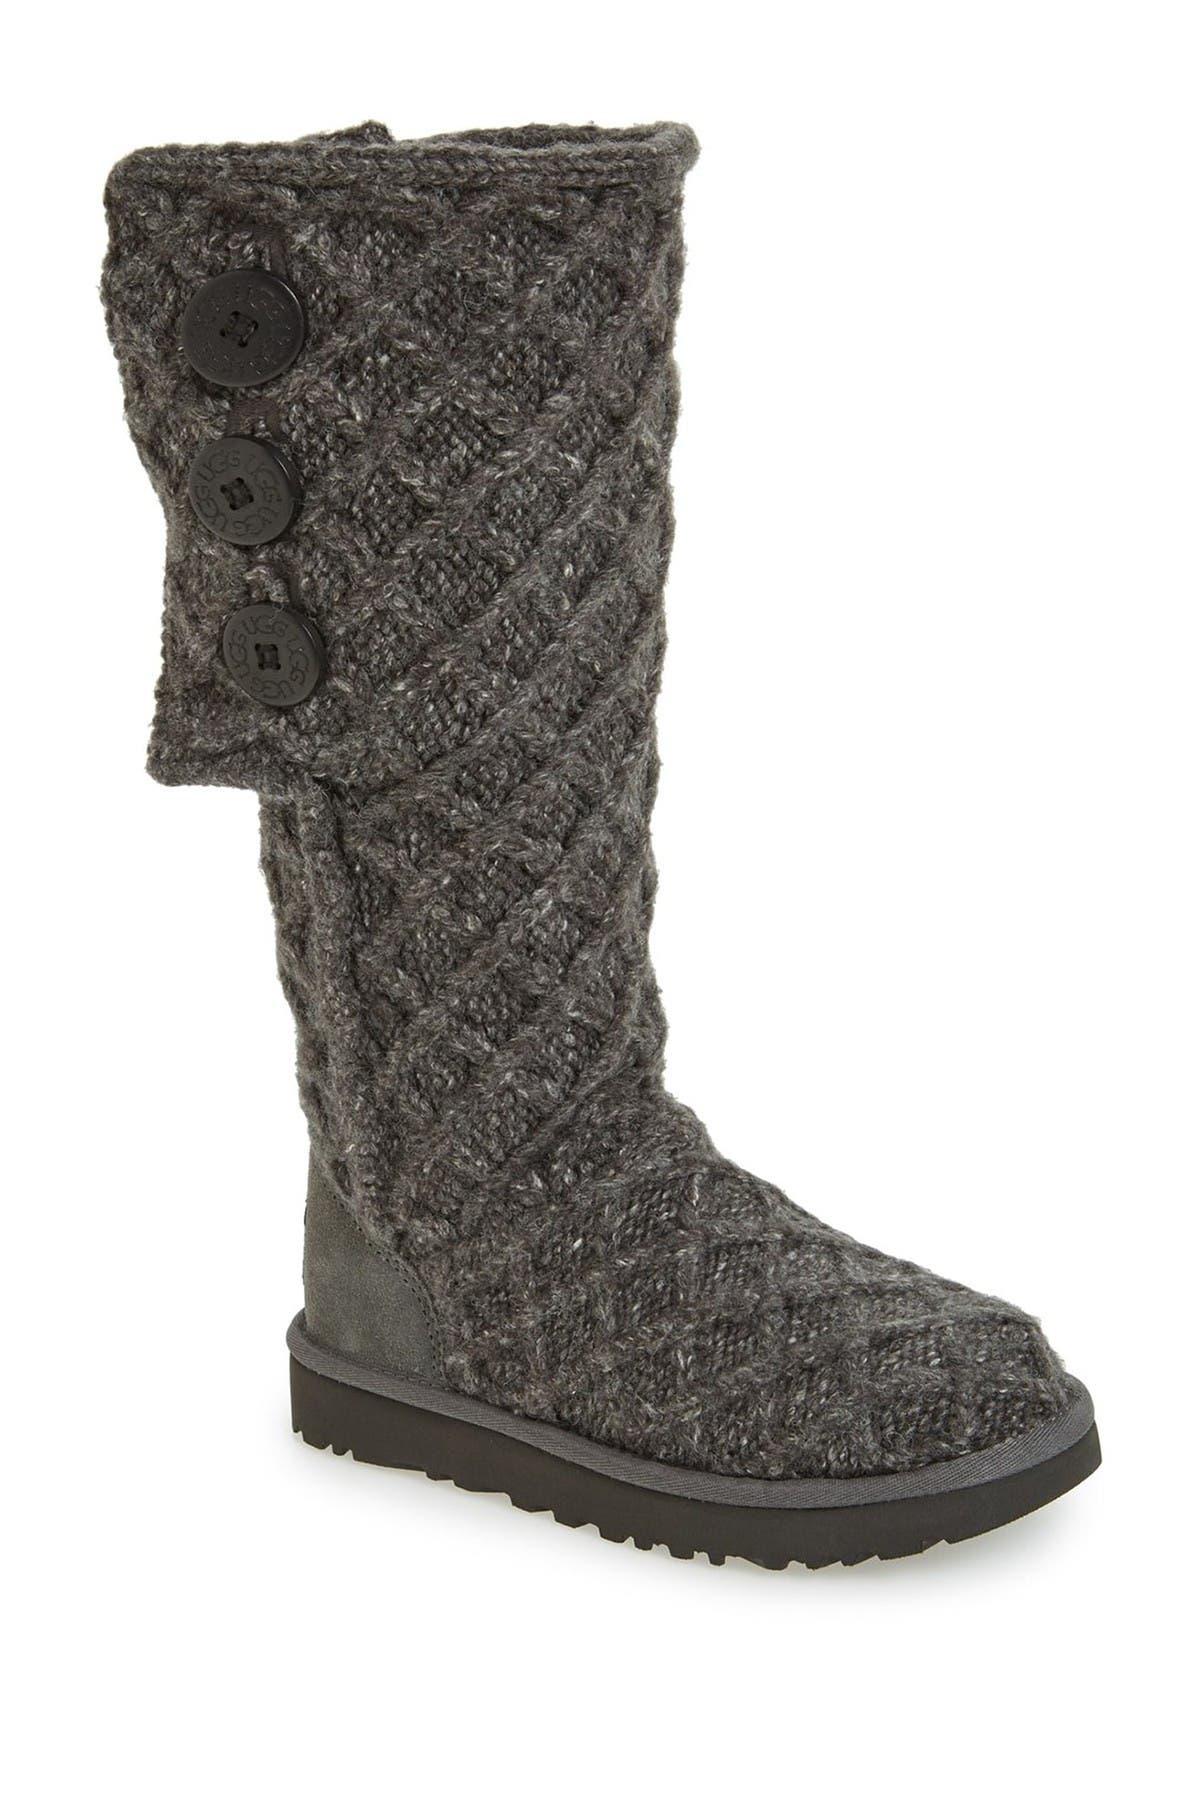 UGG | Lattice Cardy Knit Boot